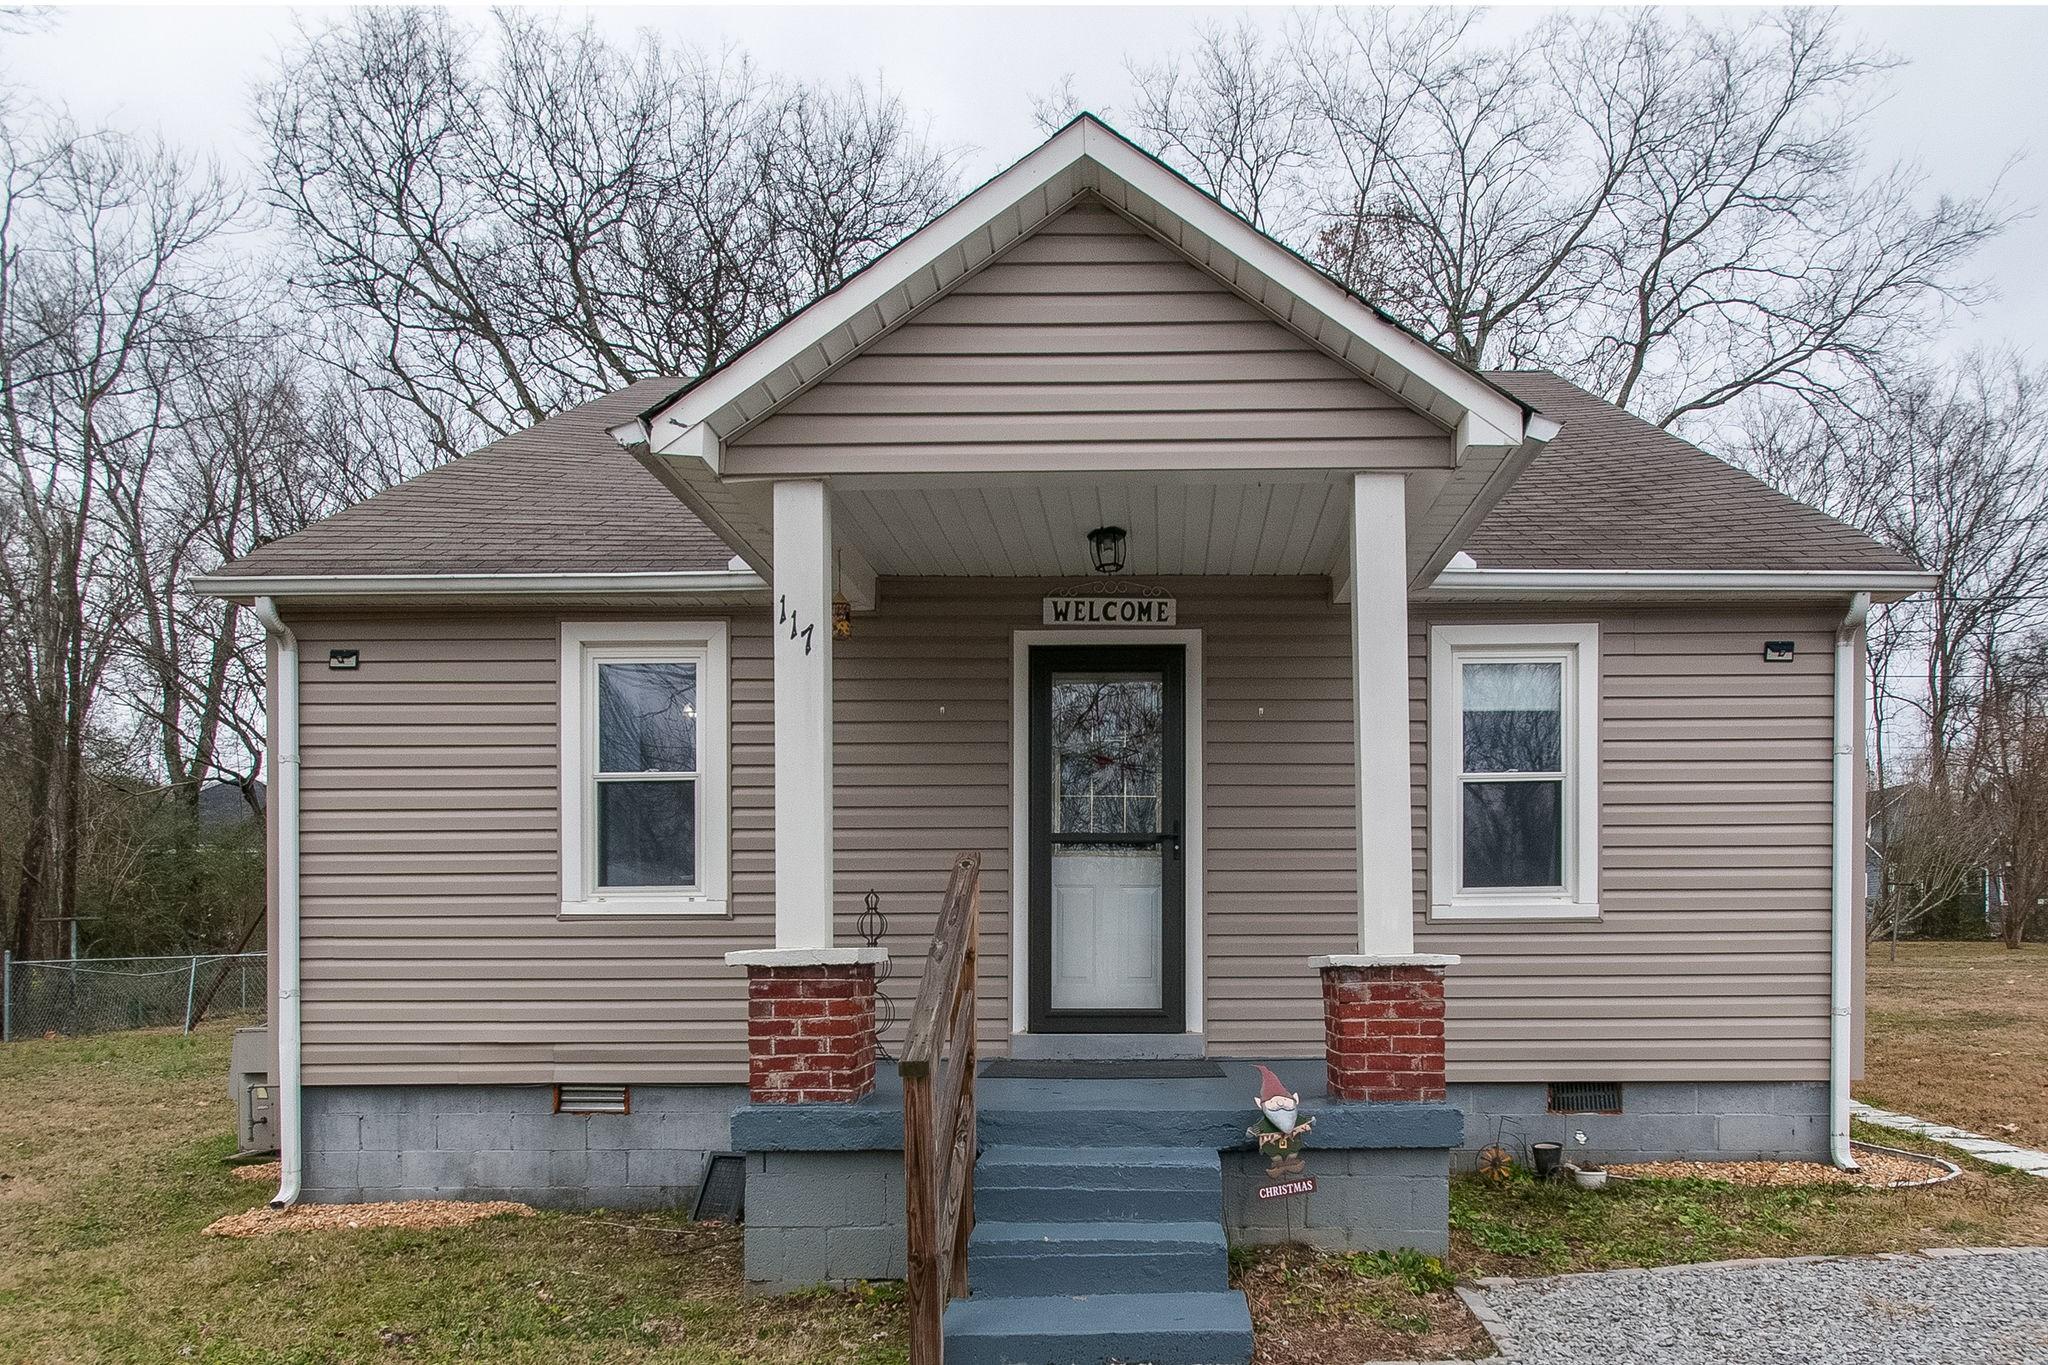 117 N Vine St, Ashland City, TN 37015 - Ashland City, TN real estate listing